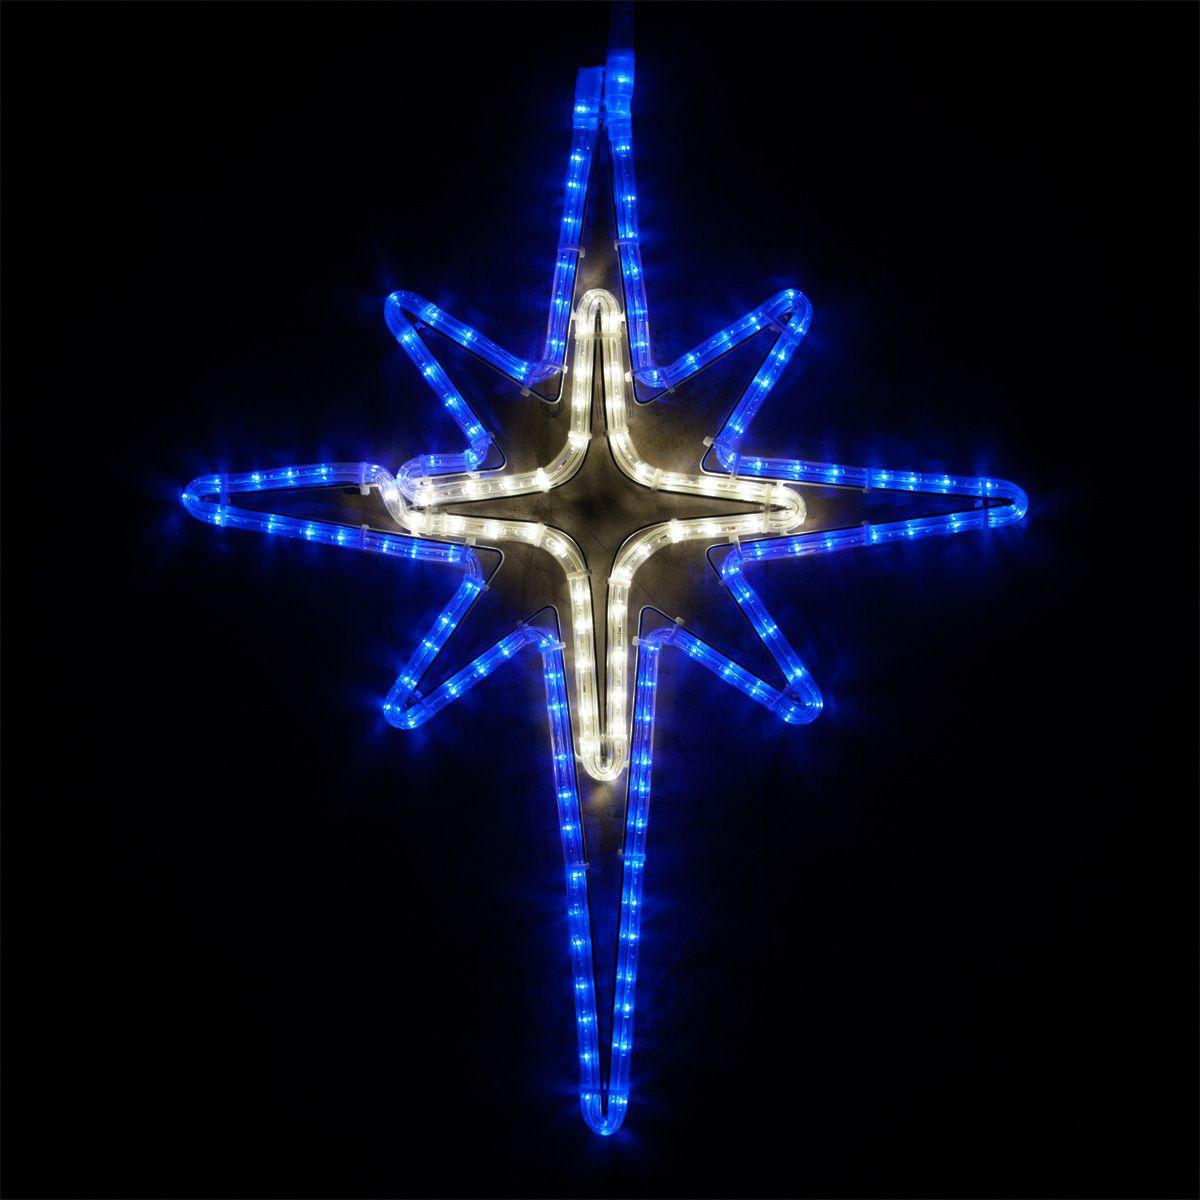 28 led blue and cool white bethlehem star crafts ideas 28 led blue and cool white bethlehem star mozeypictures Choice Image